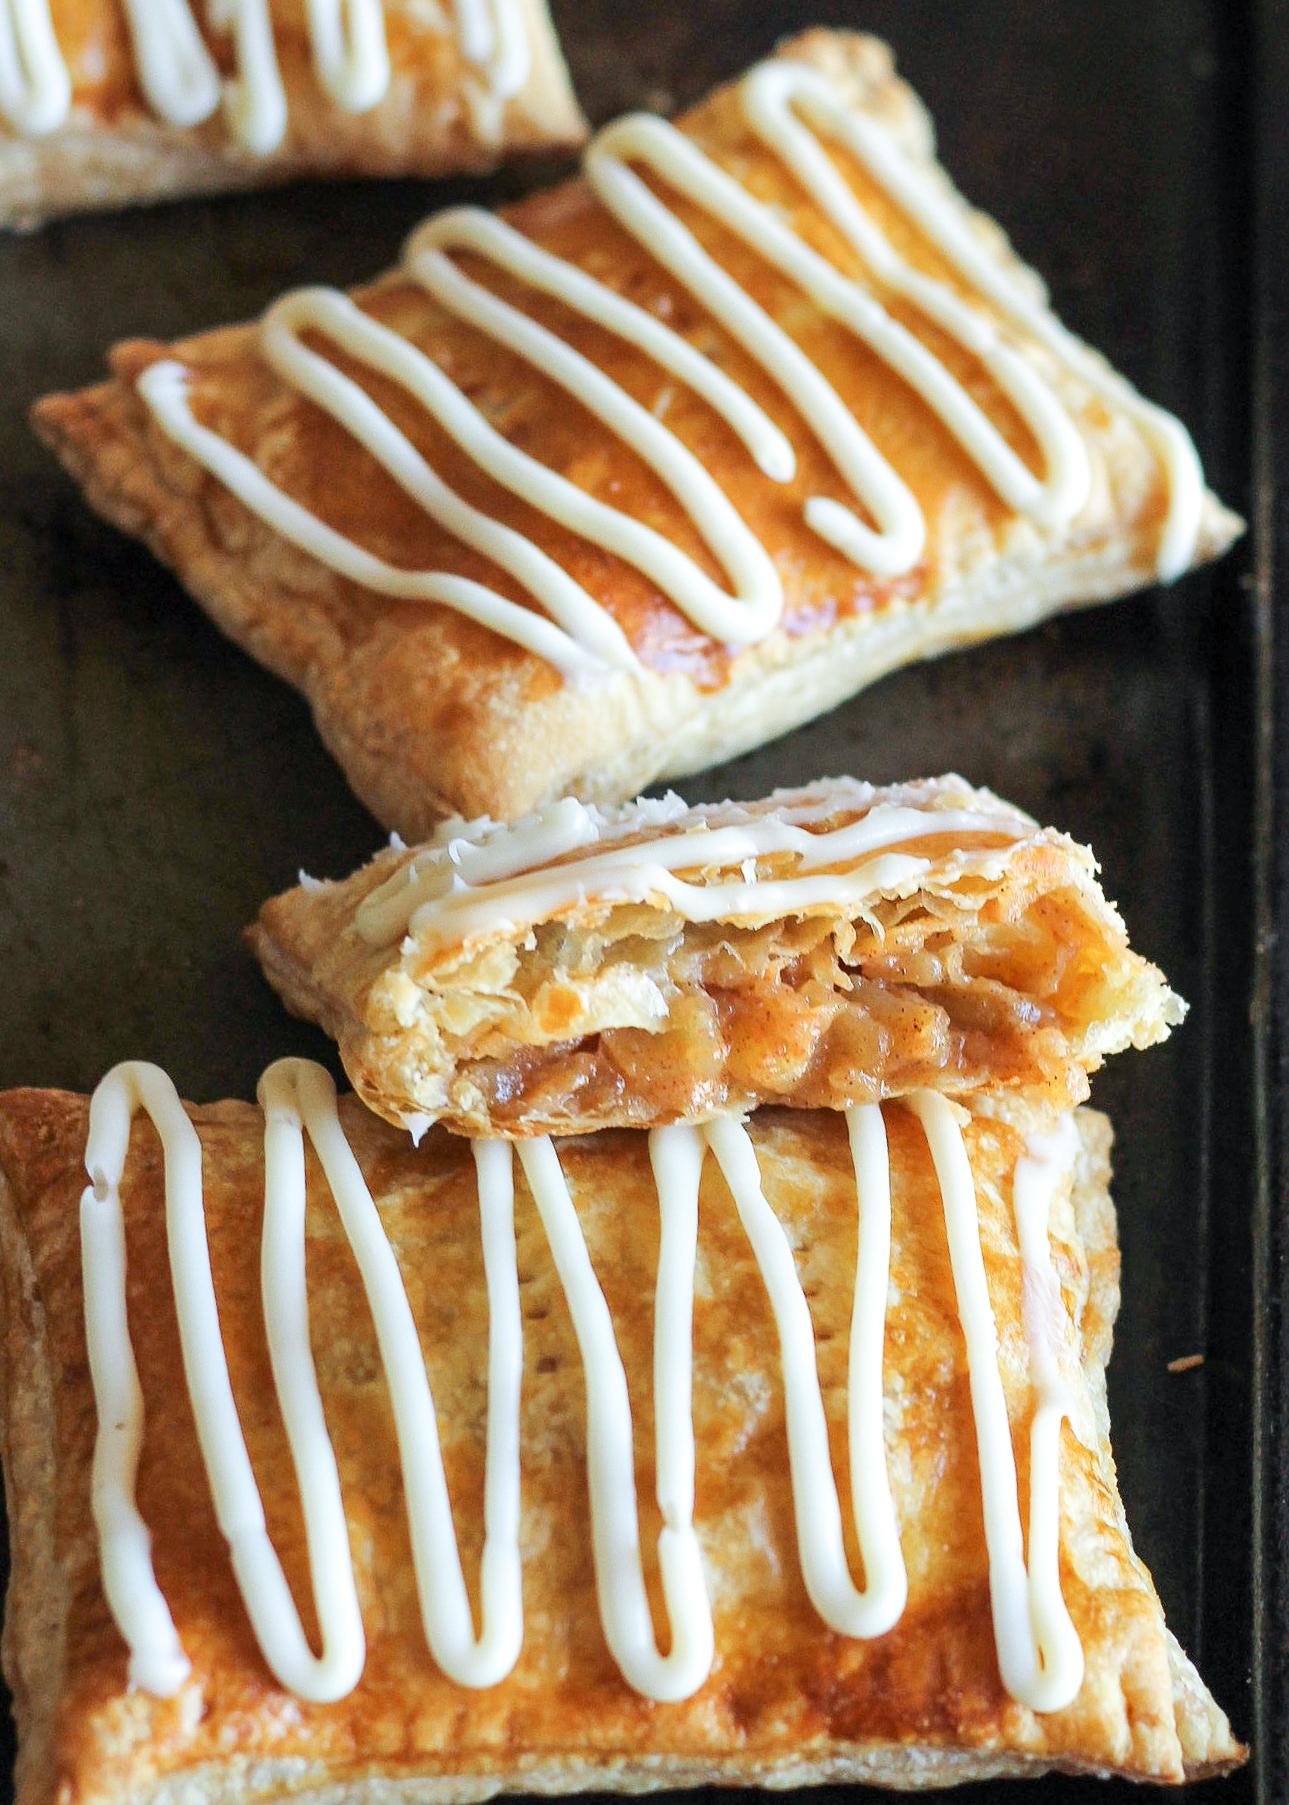 Caramel Apple Toaster Strudel - Caramel Apple Desserts